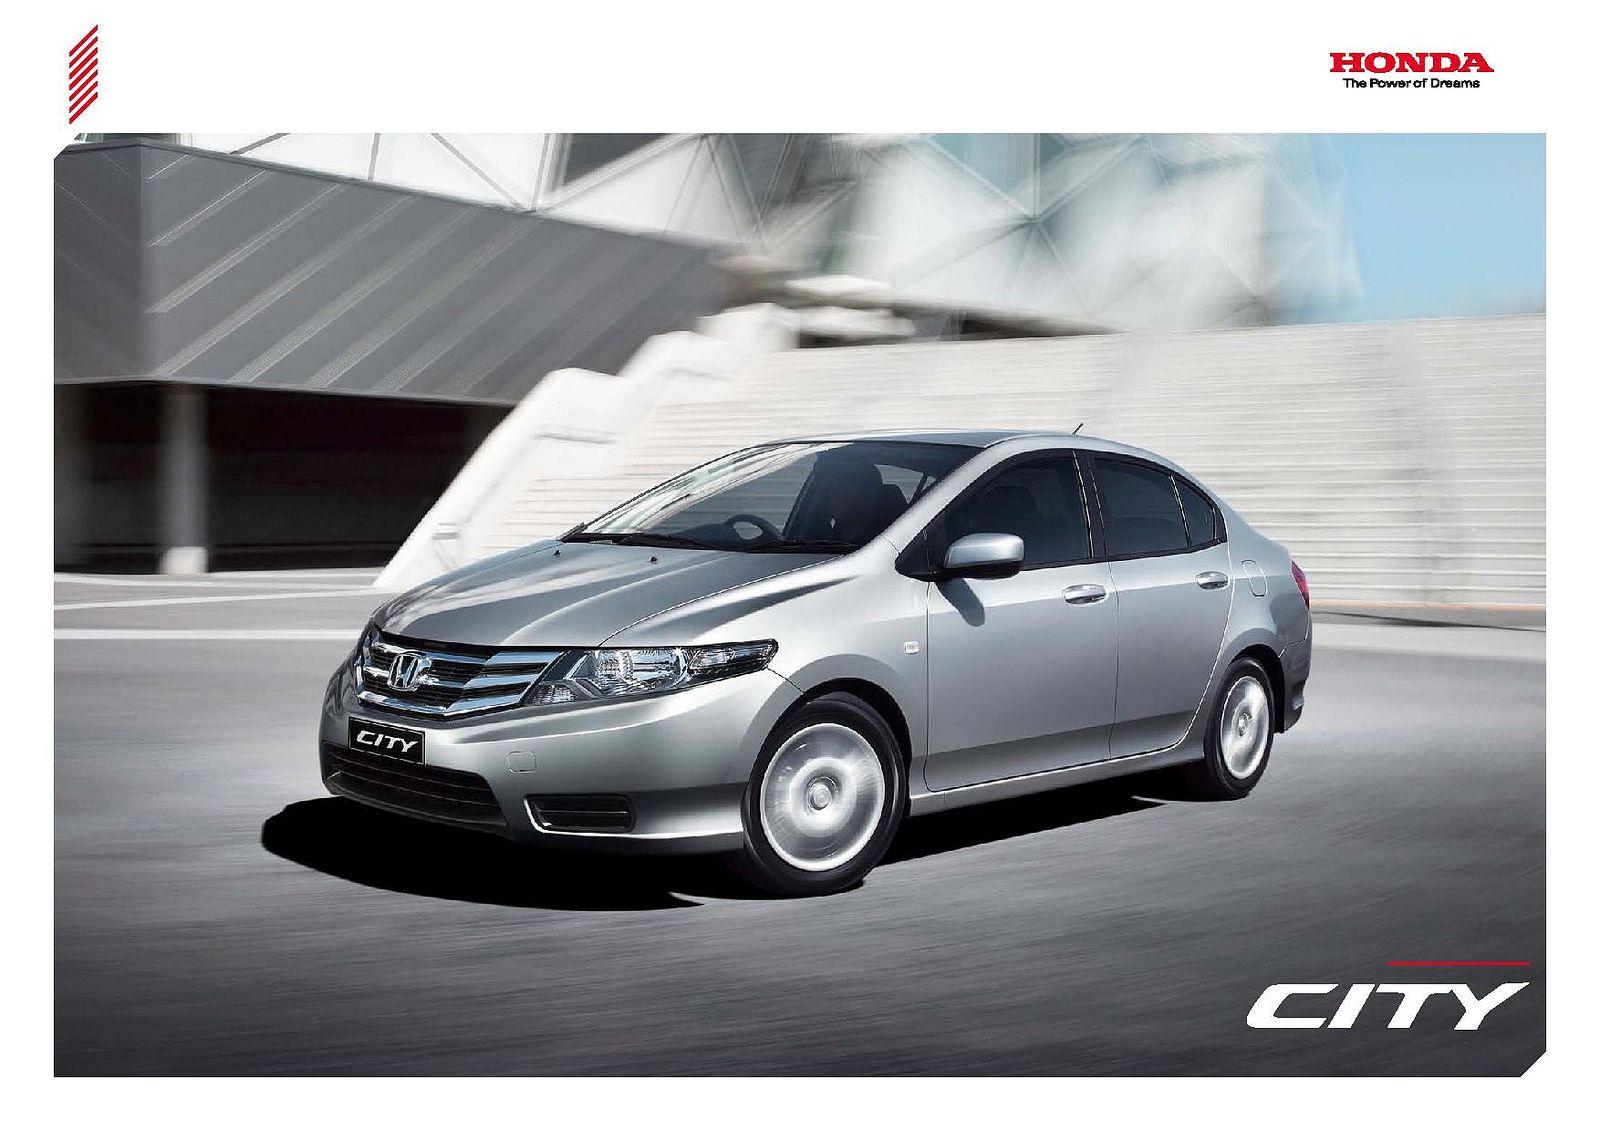 Honda city mk5 new zealand brochure 2012